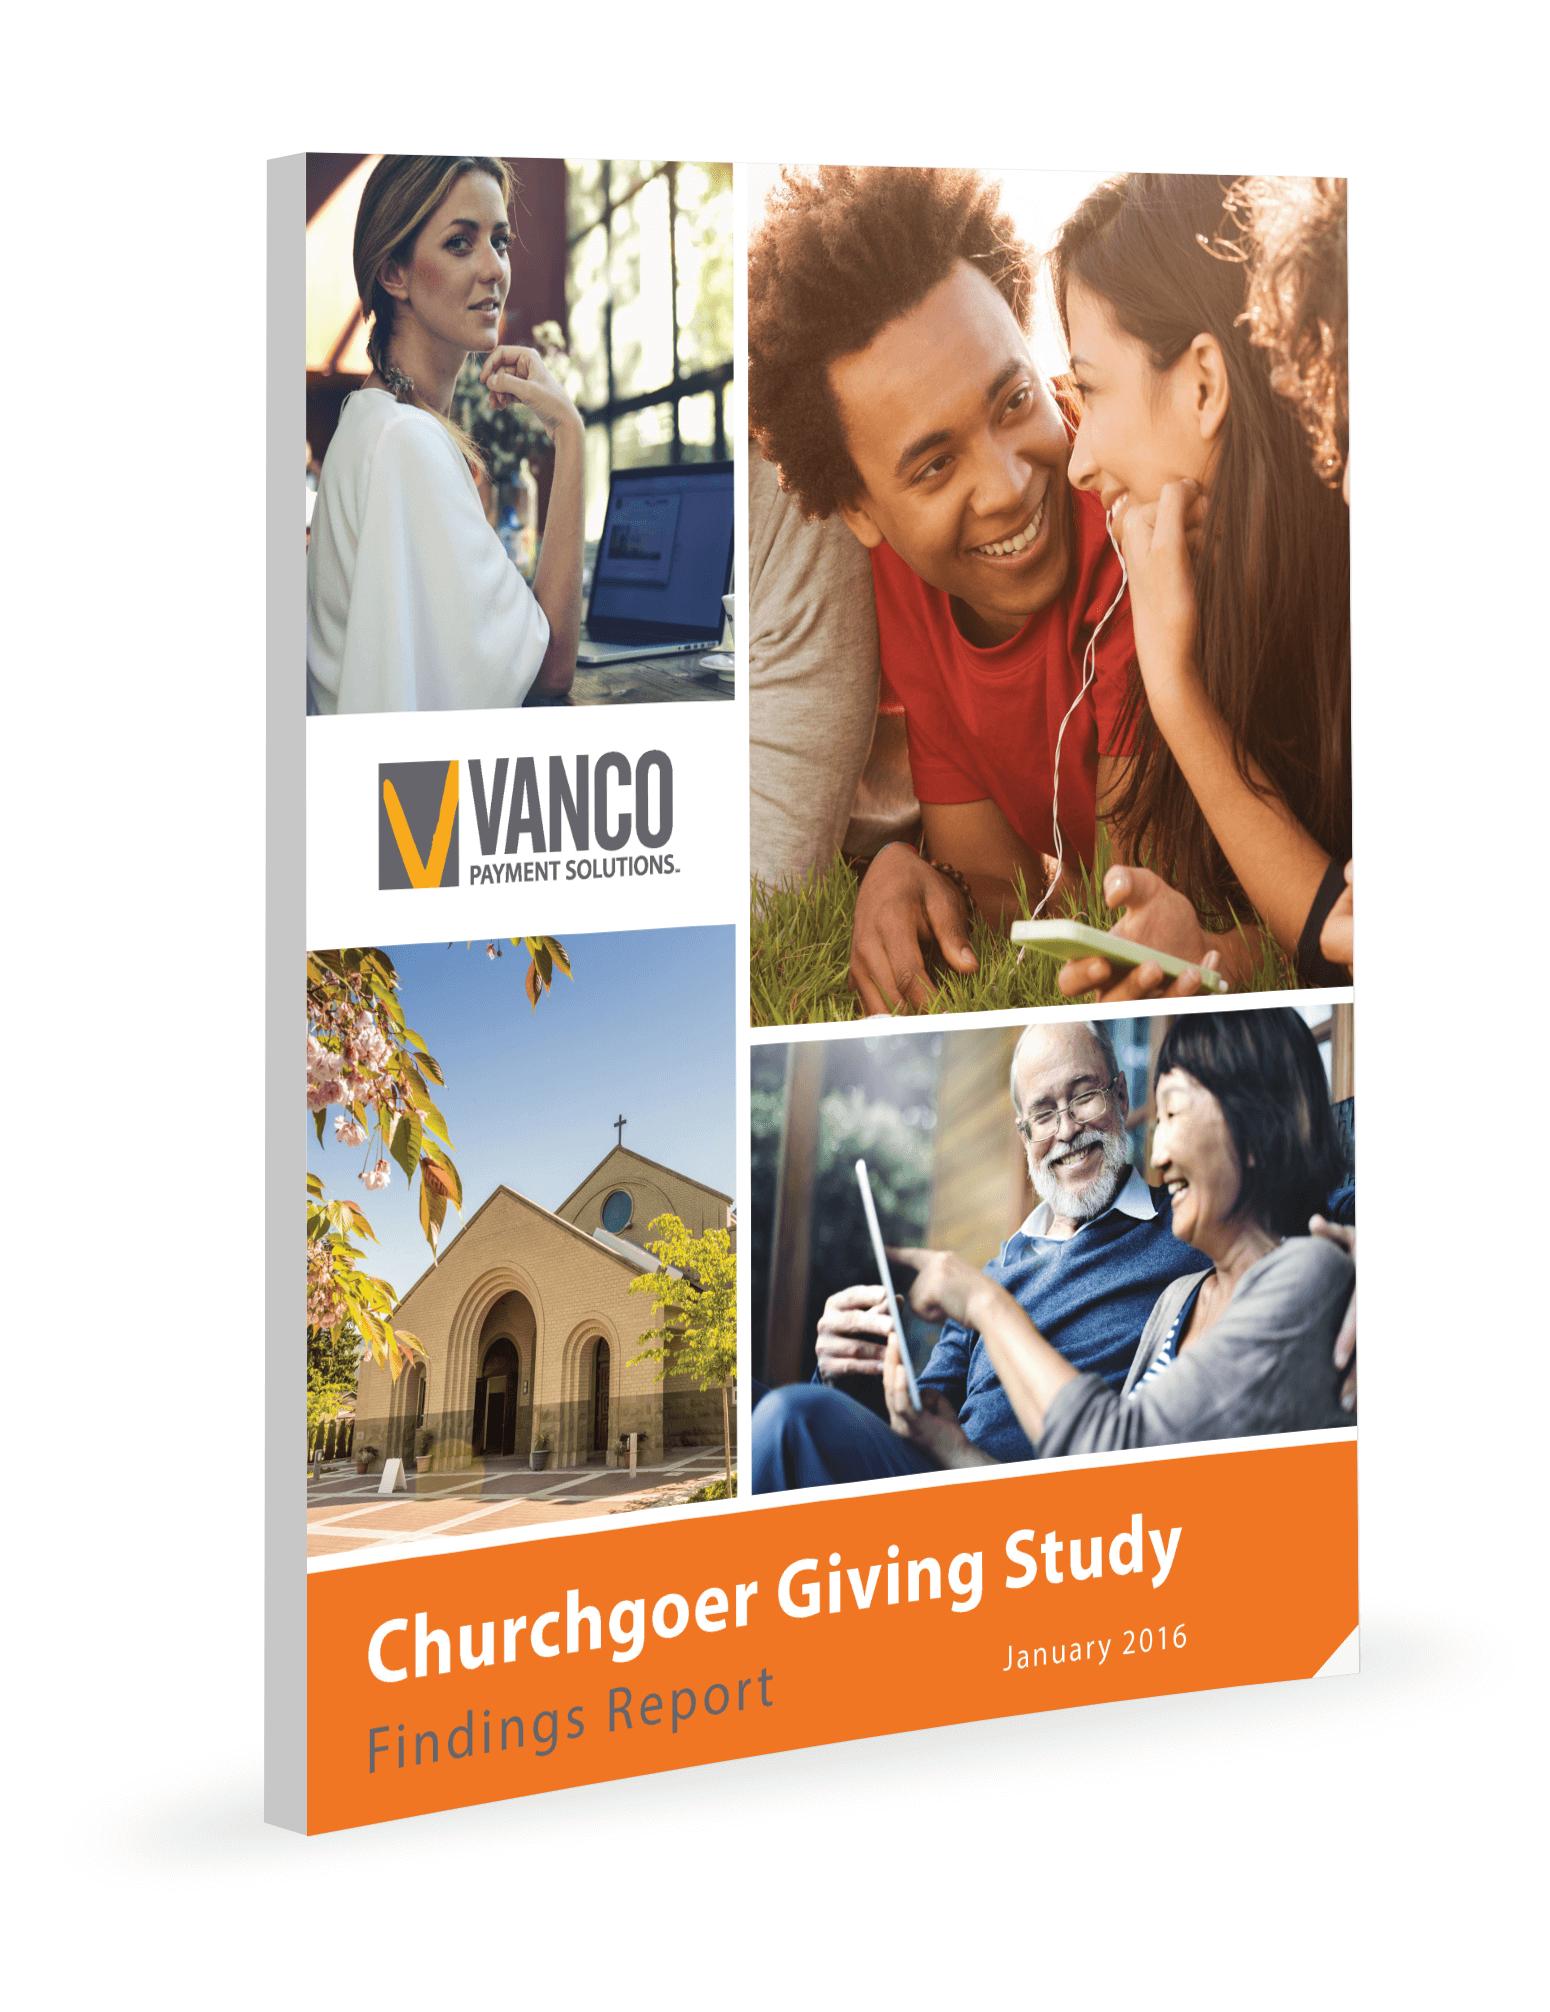 Churchgoer Giving Study Findings Report